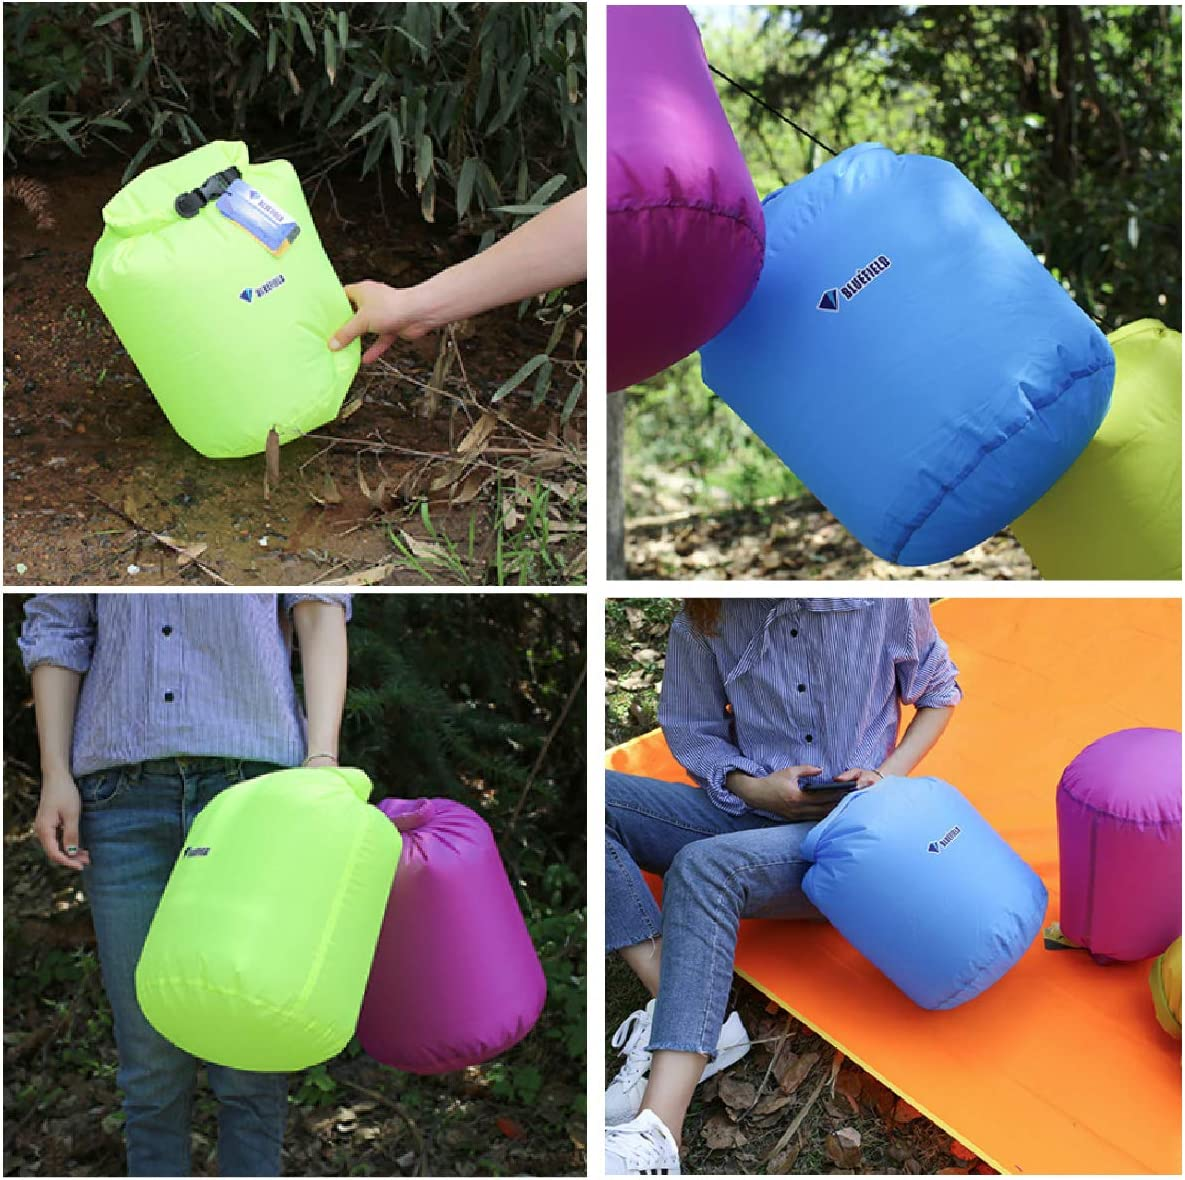 TRIWONDER Bolsa Estanca Impermeable Bolsa Seca para Camping Playa Navegaci/ón al Aire Libre